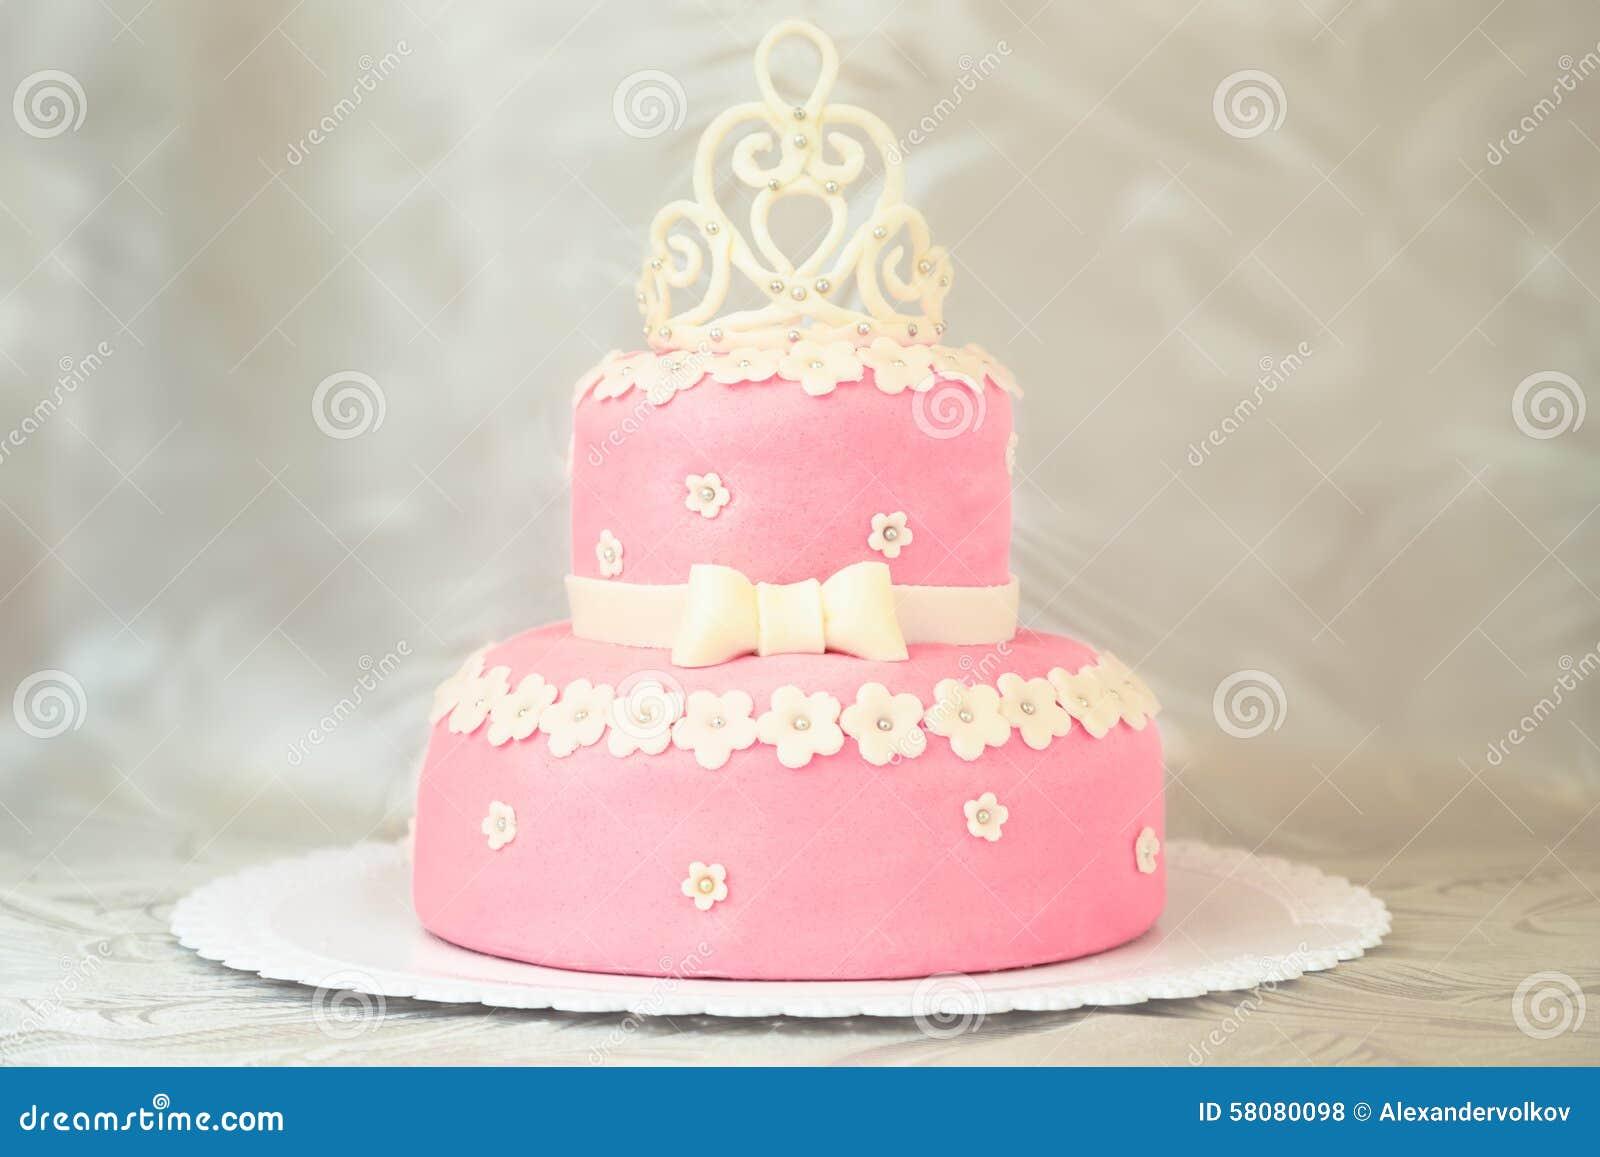 Wedding Cake Crown Design